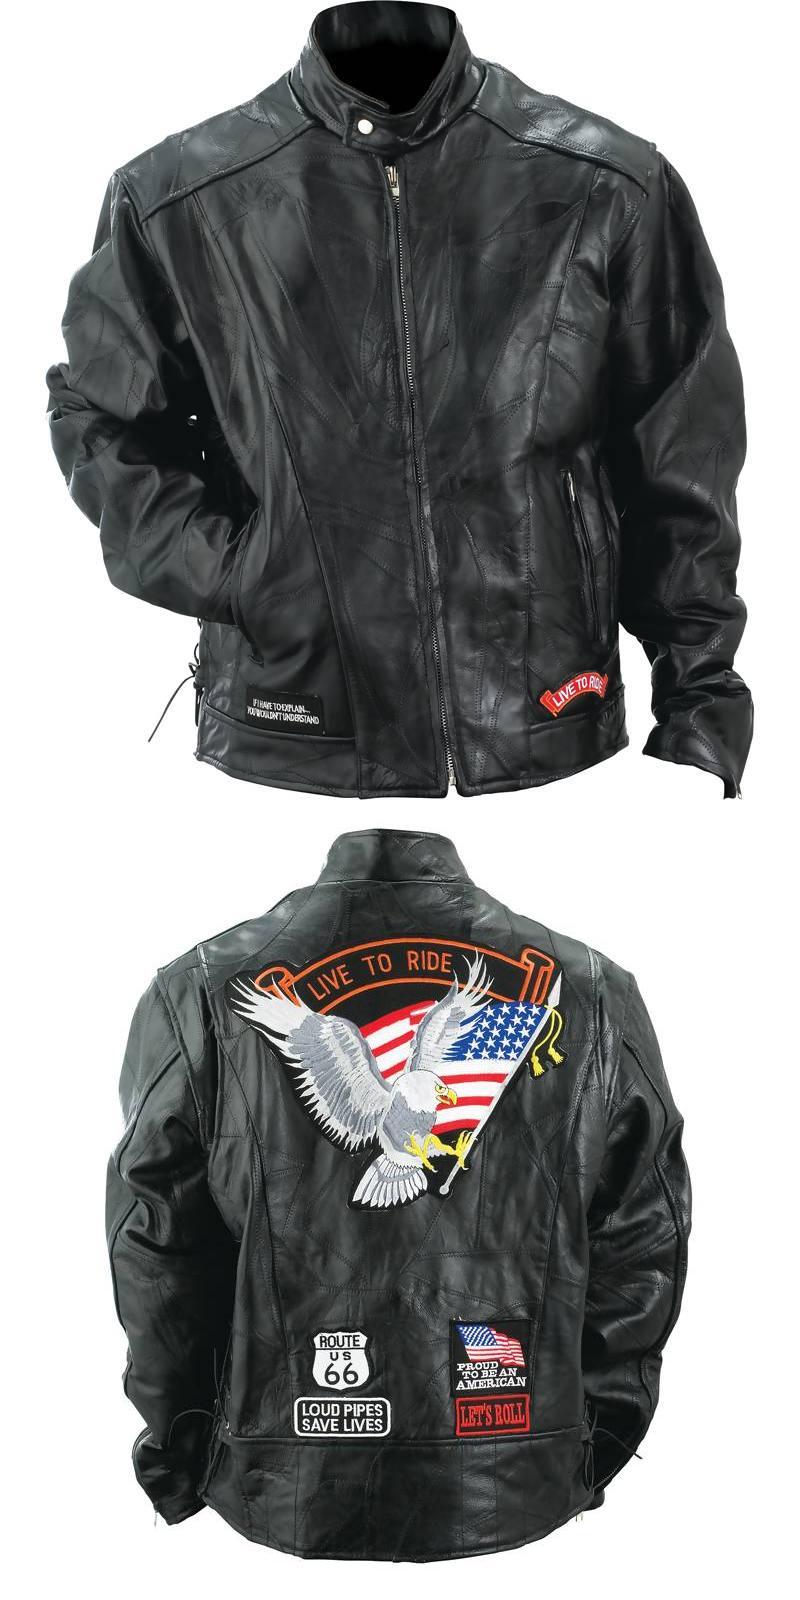 Buffalo Leather Motorcycle Jackets (GFCRLTR)